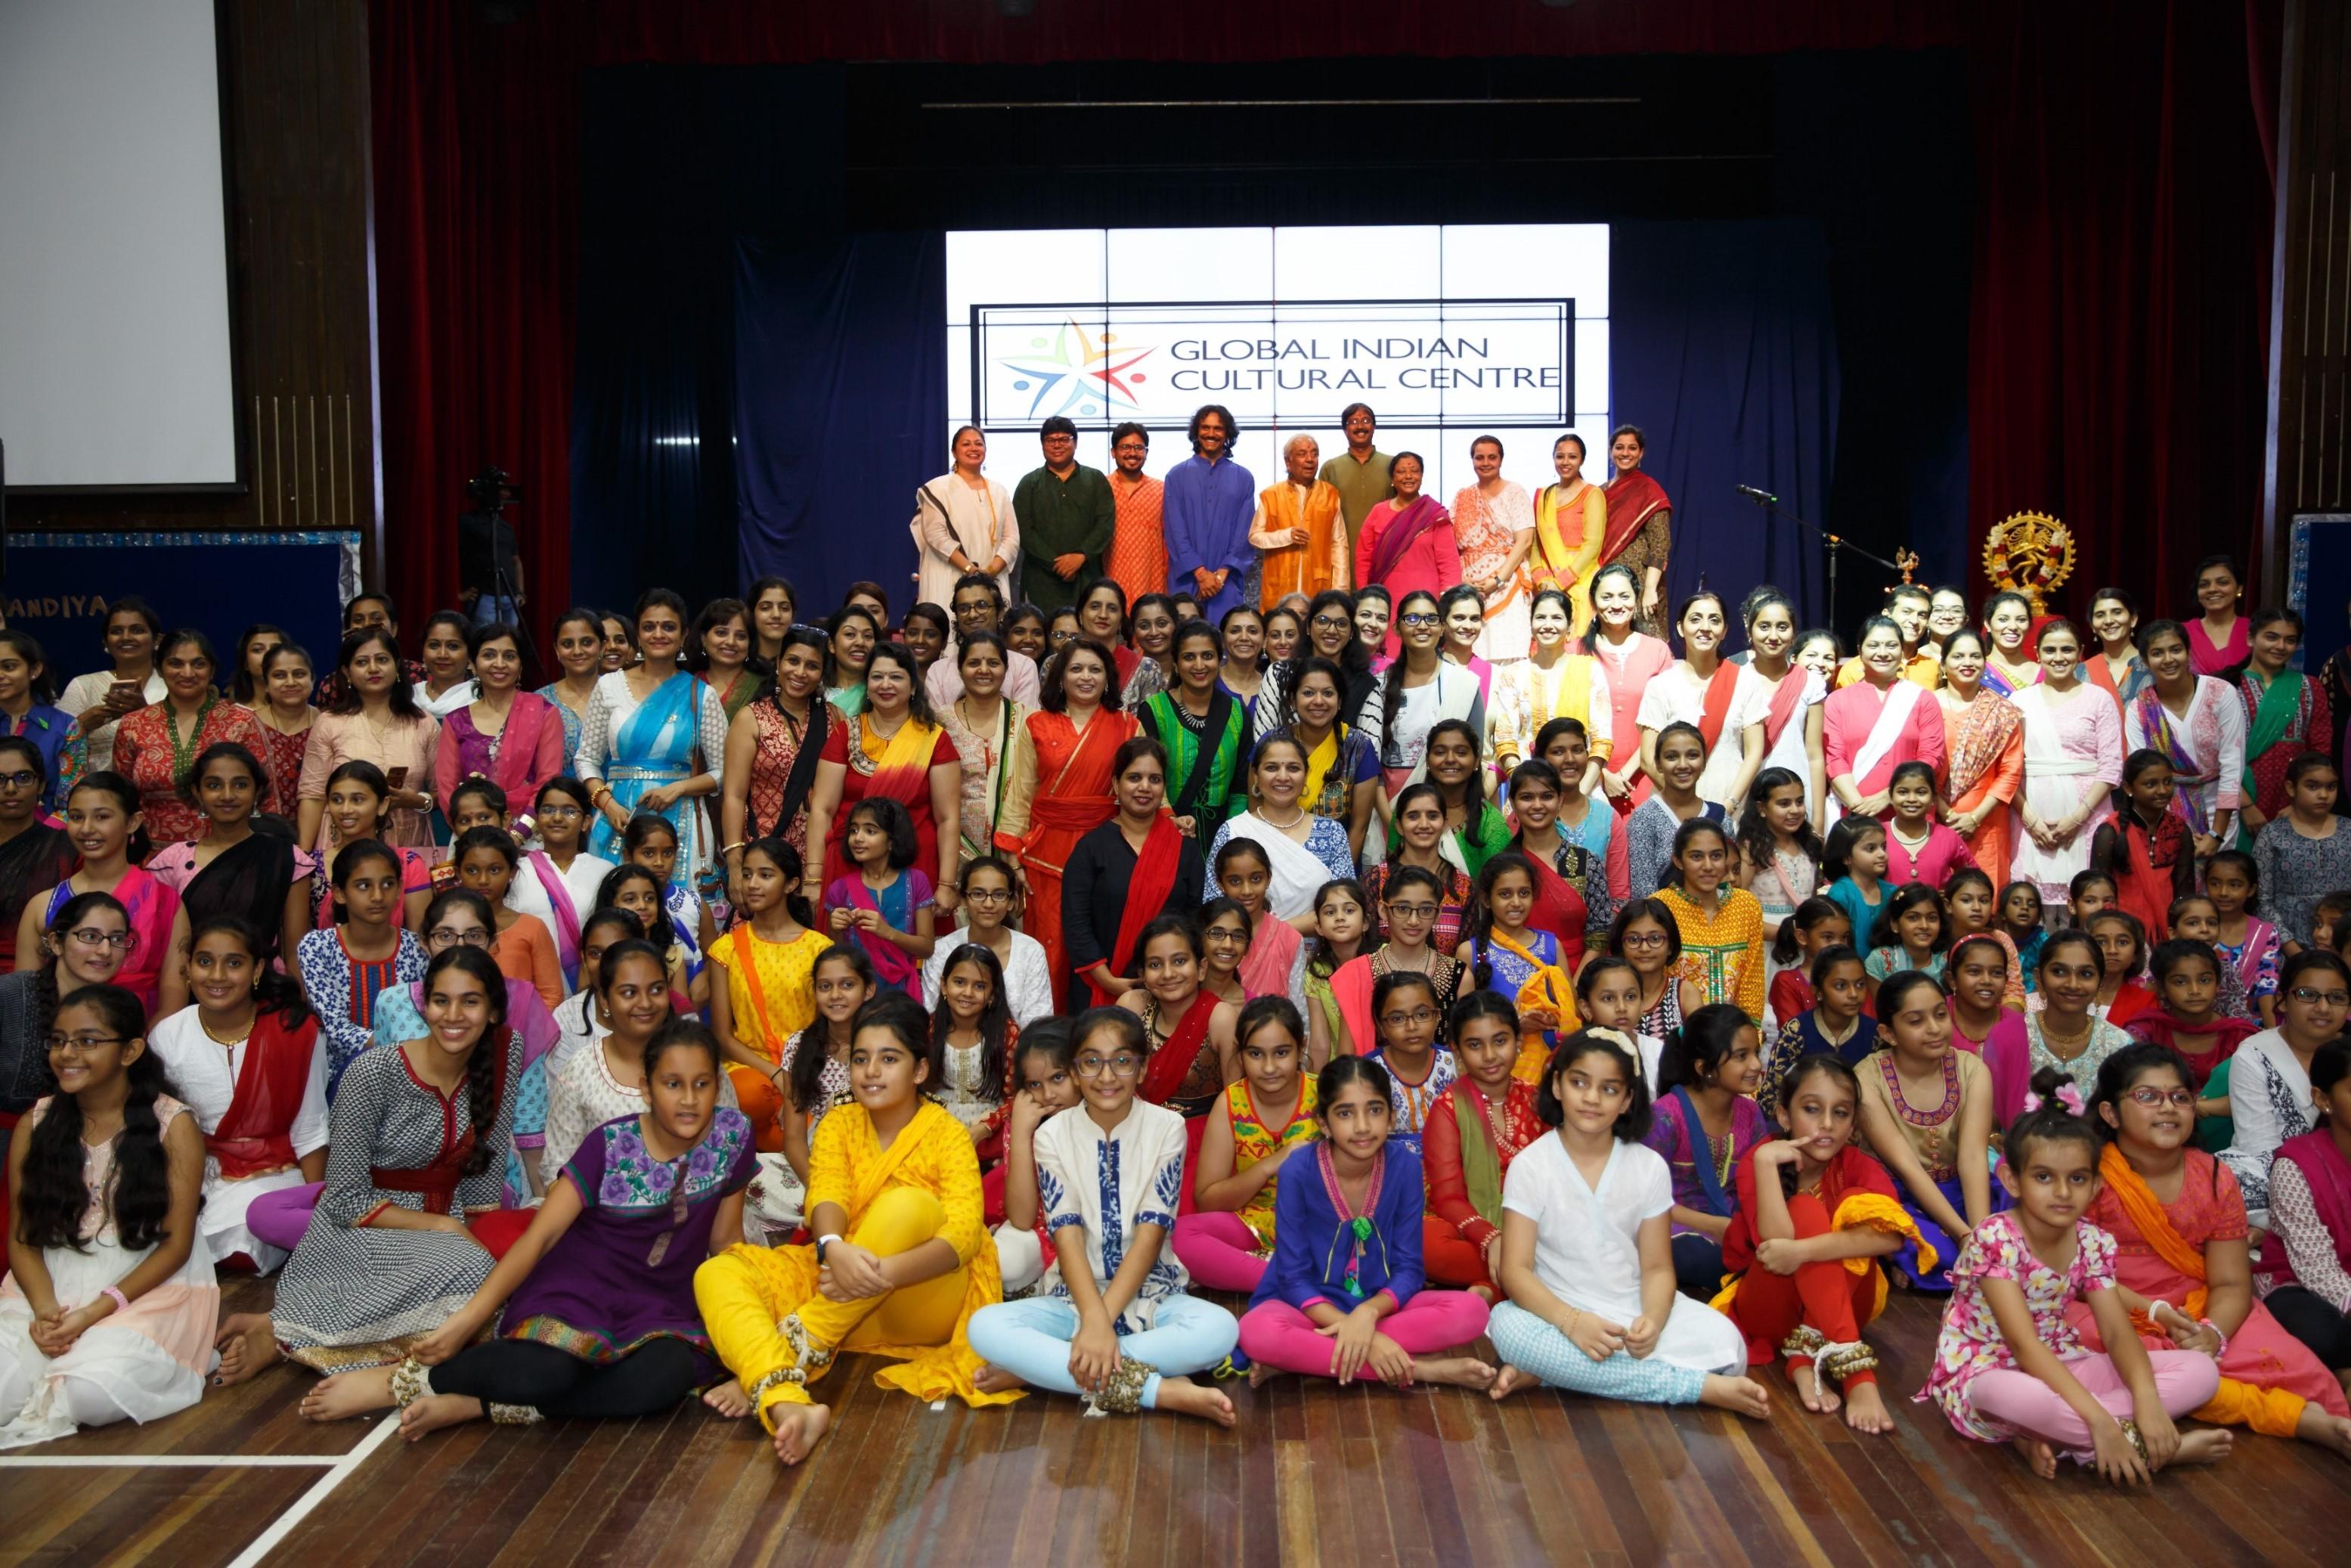 Pandit Birju Maharaj and his workshop participants in Singapore.